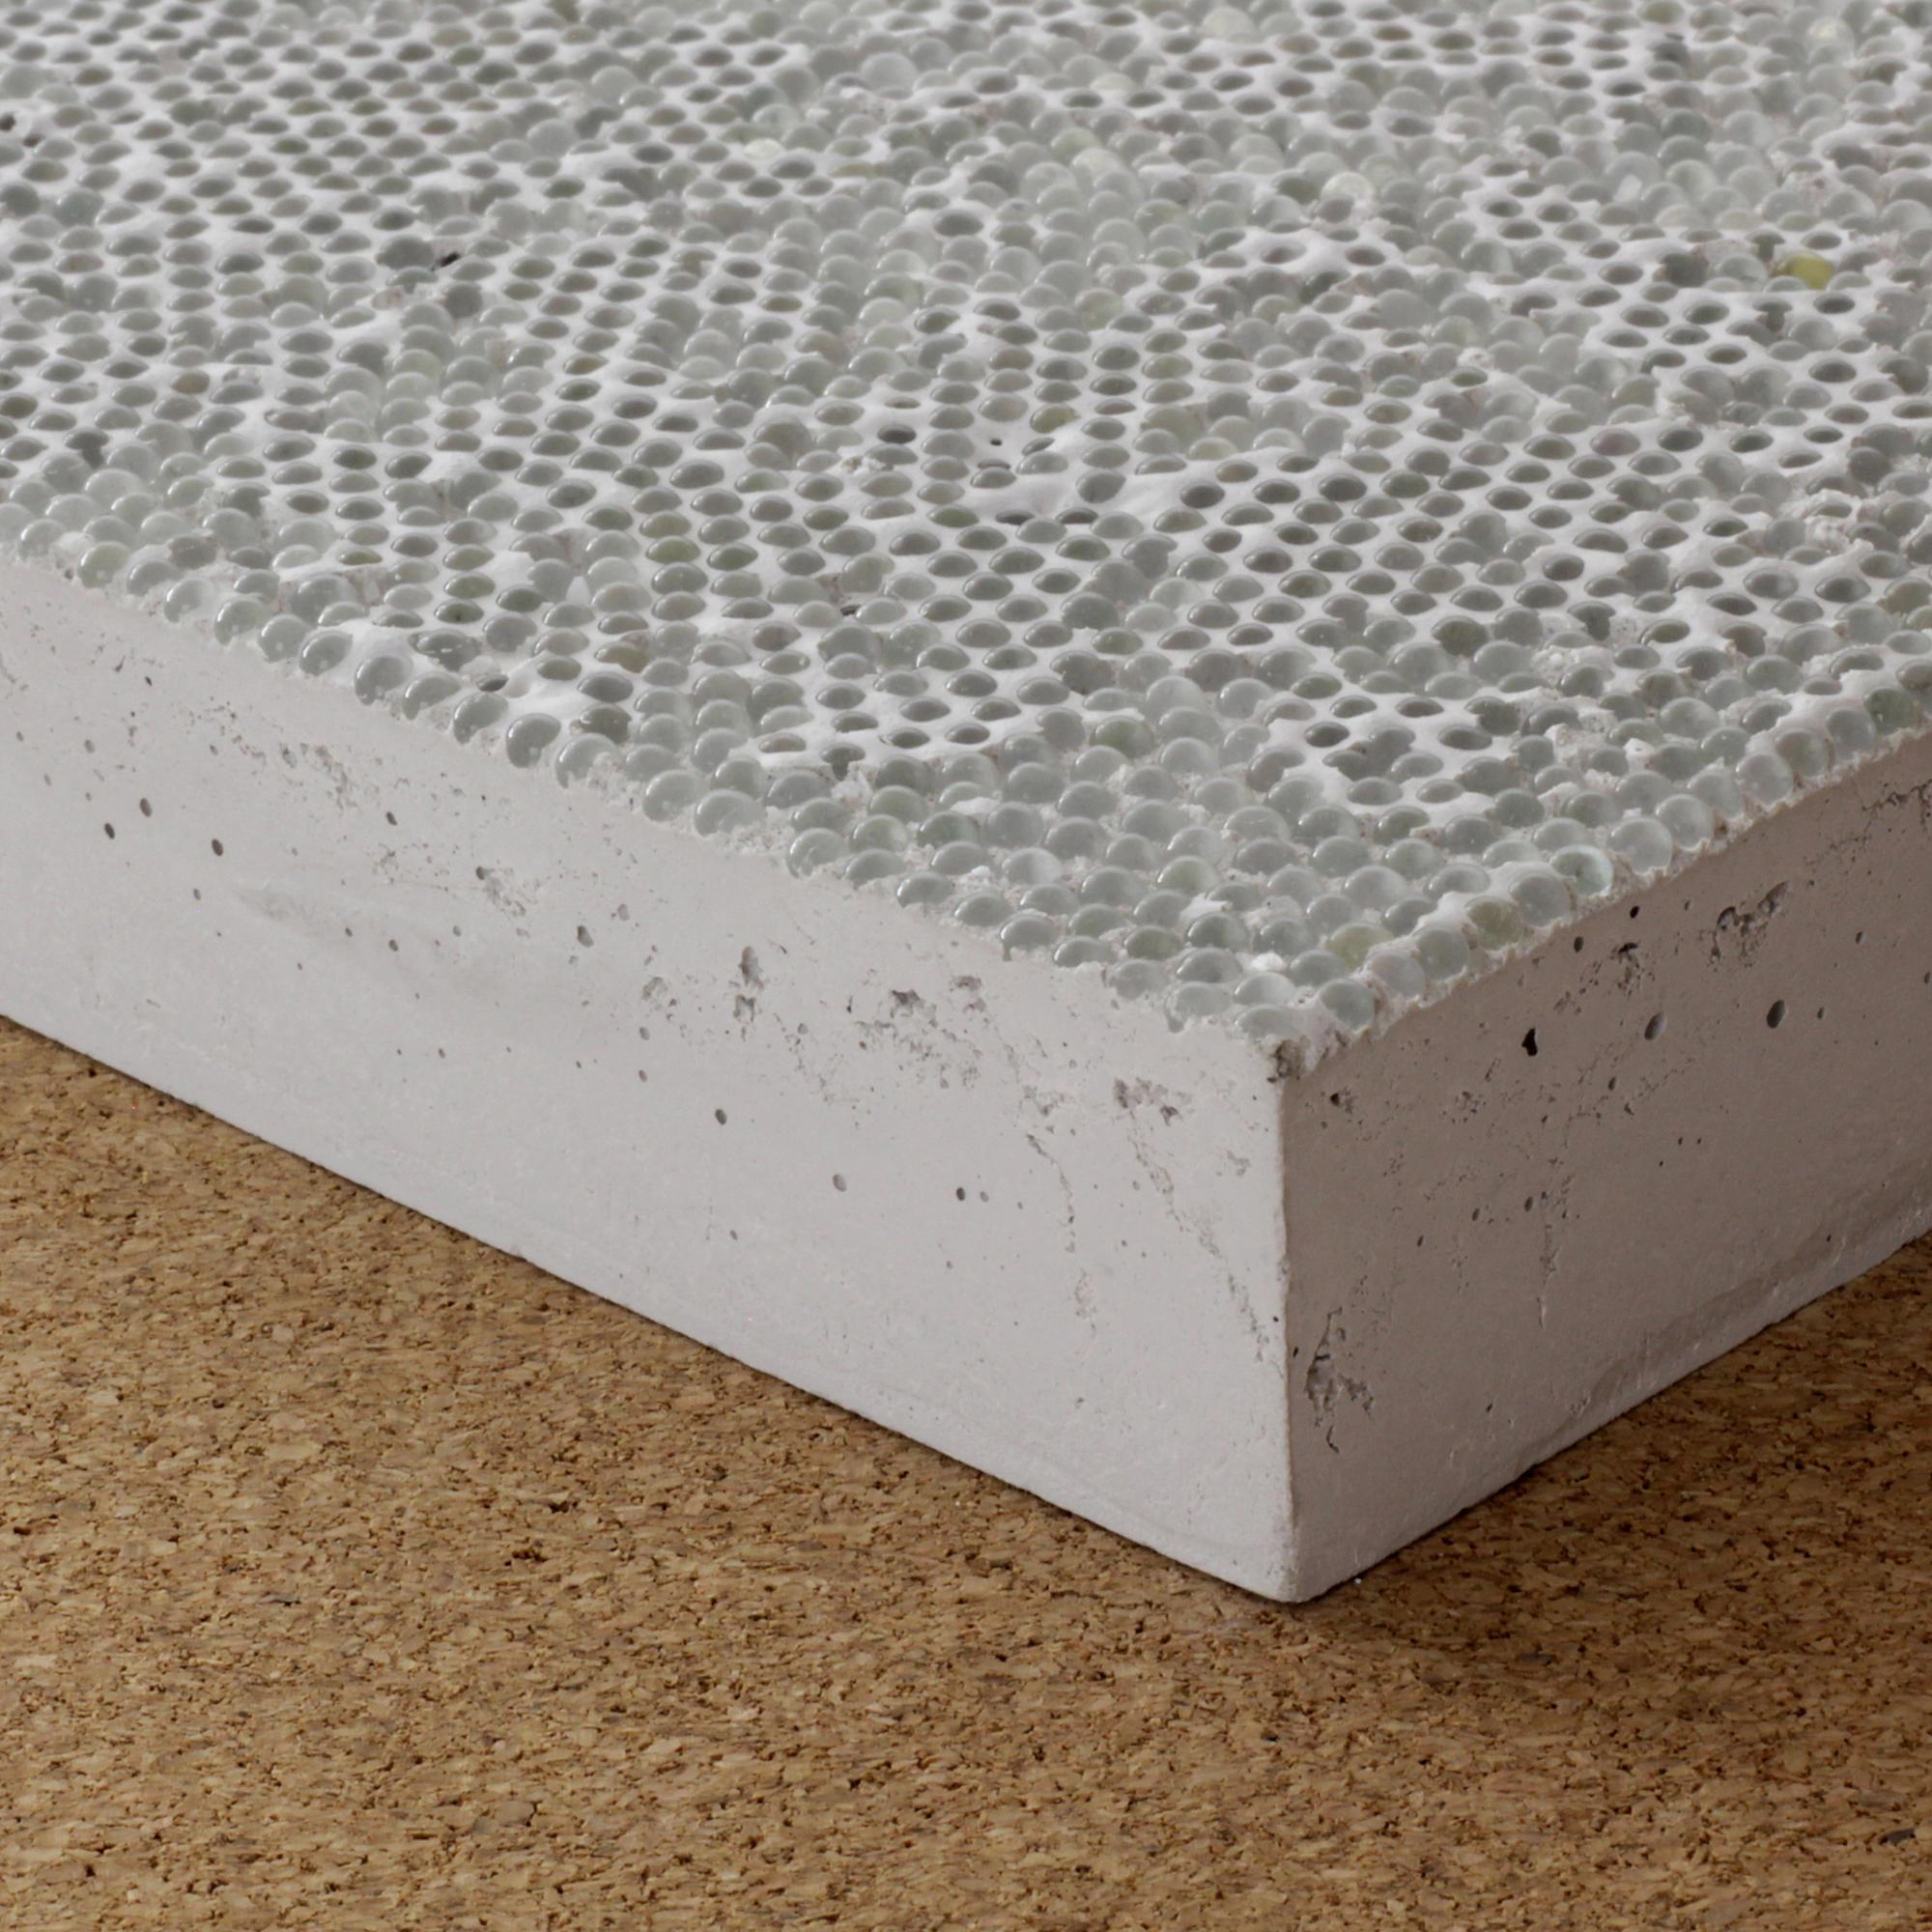 Retroreflective High Performance Concrete Concrete From